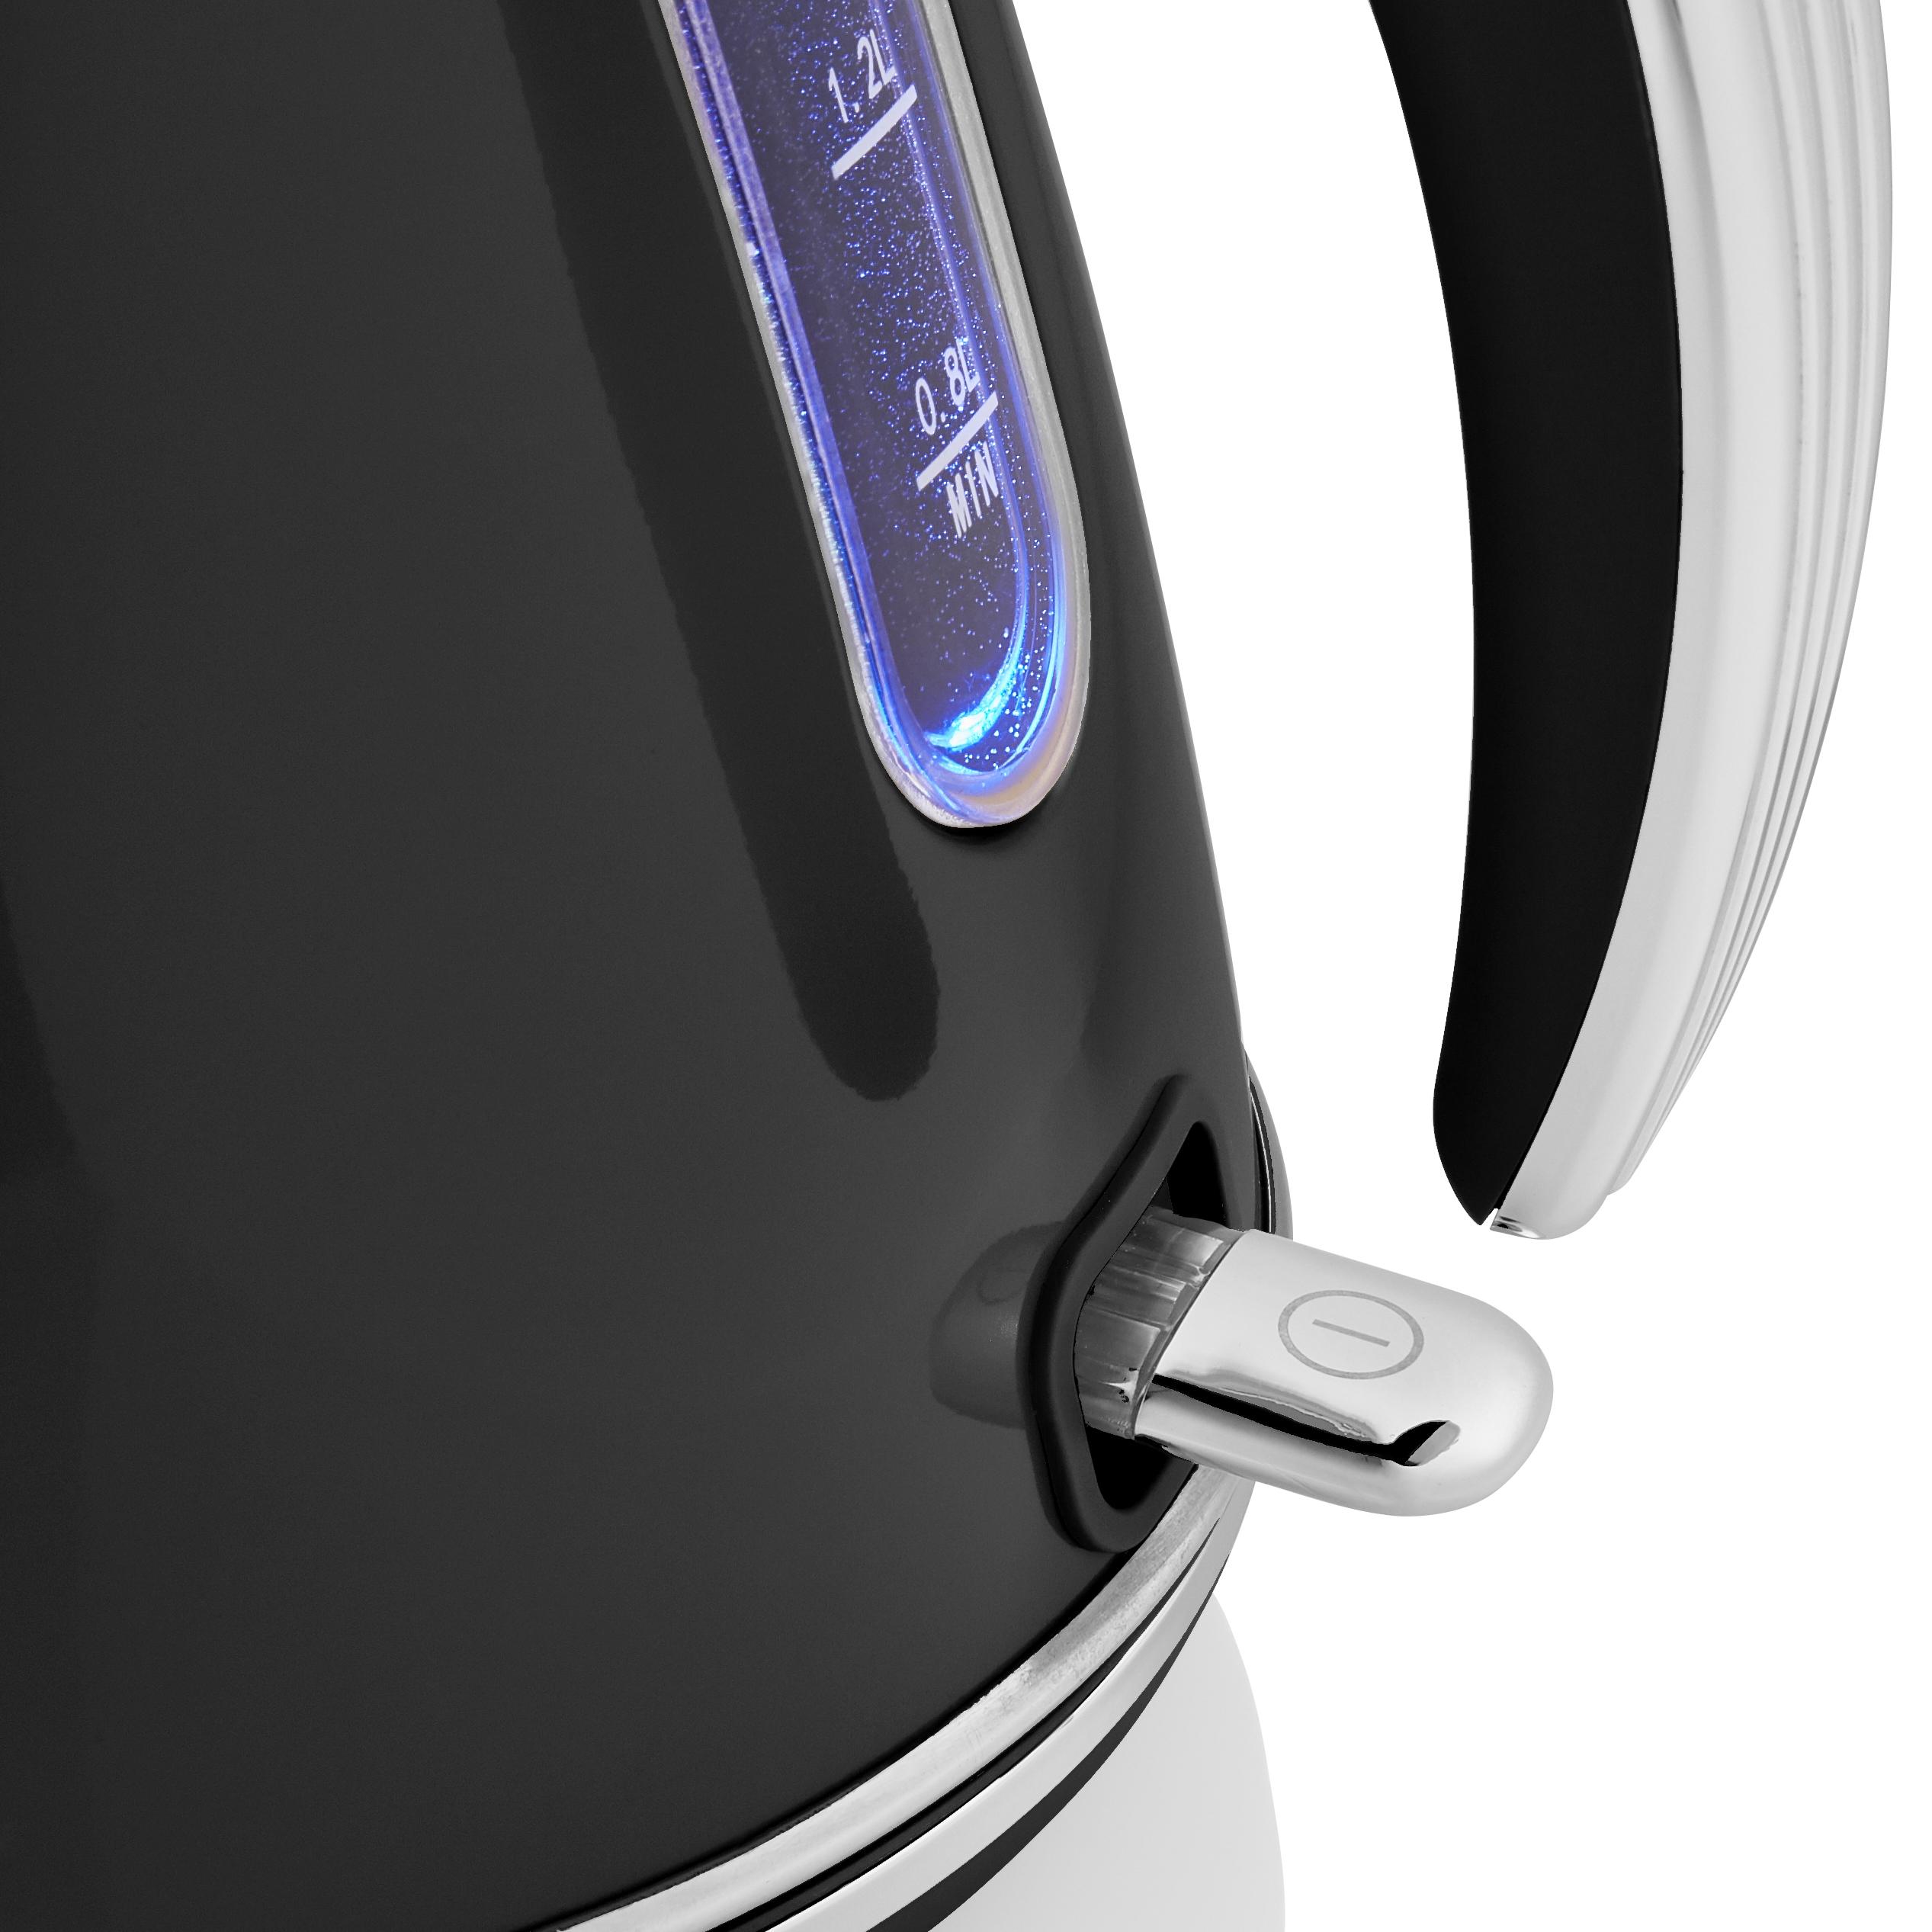 thumbnail 5 - Swan Retro 1.5L Jug Kettle 3KW, 2 Slice Toaster 815W & 20L Digital Microwave Set